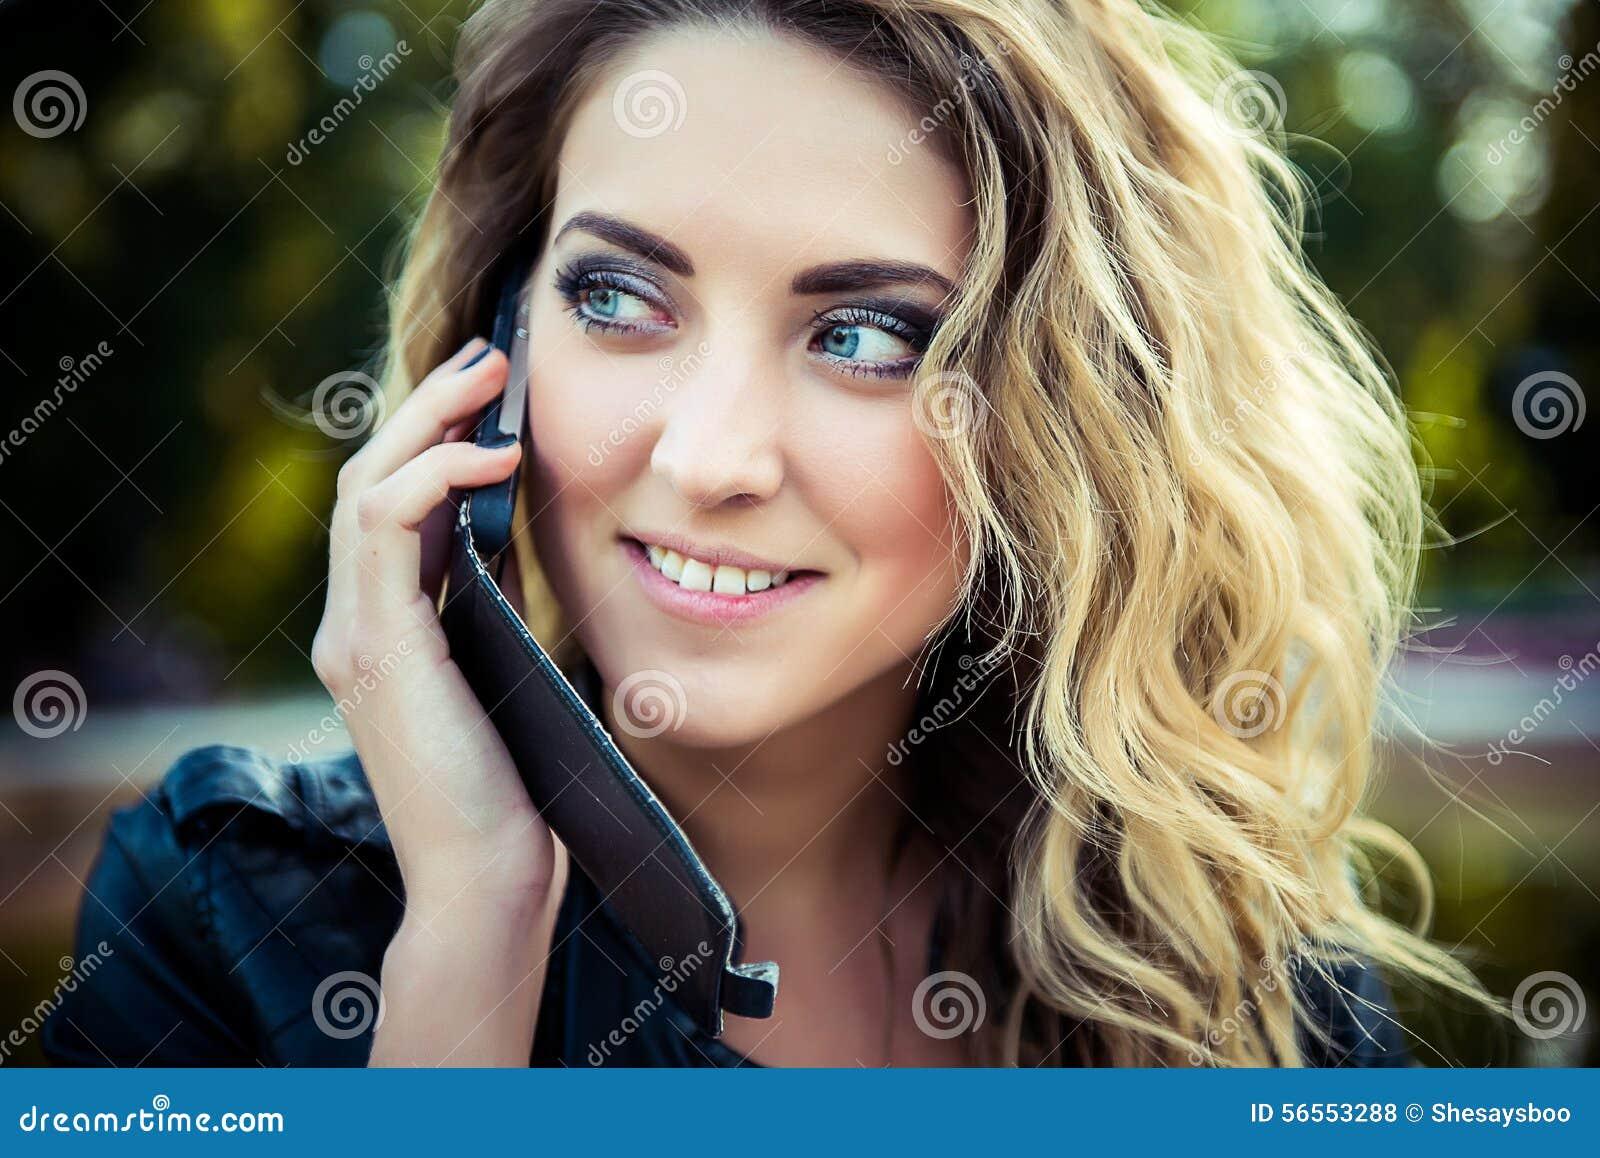 Download Τοποθέτηση κοριτσιών μόδας με το σακάκι δέρματος Στοκ Εικόνες - εικόνα από άνθρωποι, συγκινήσεις: 56553288